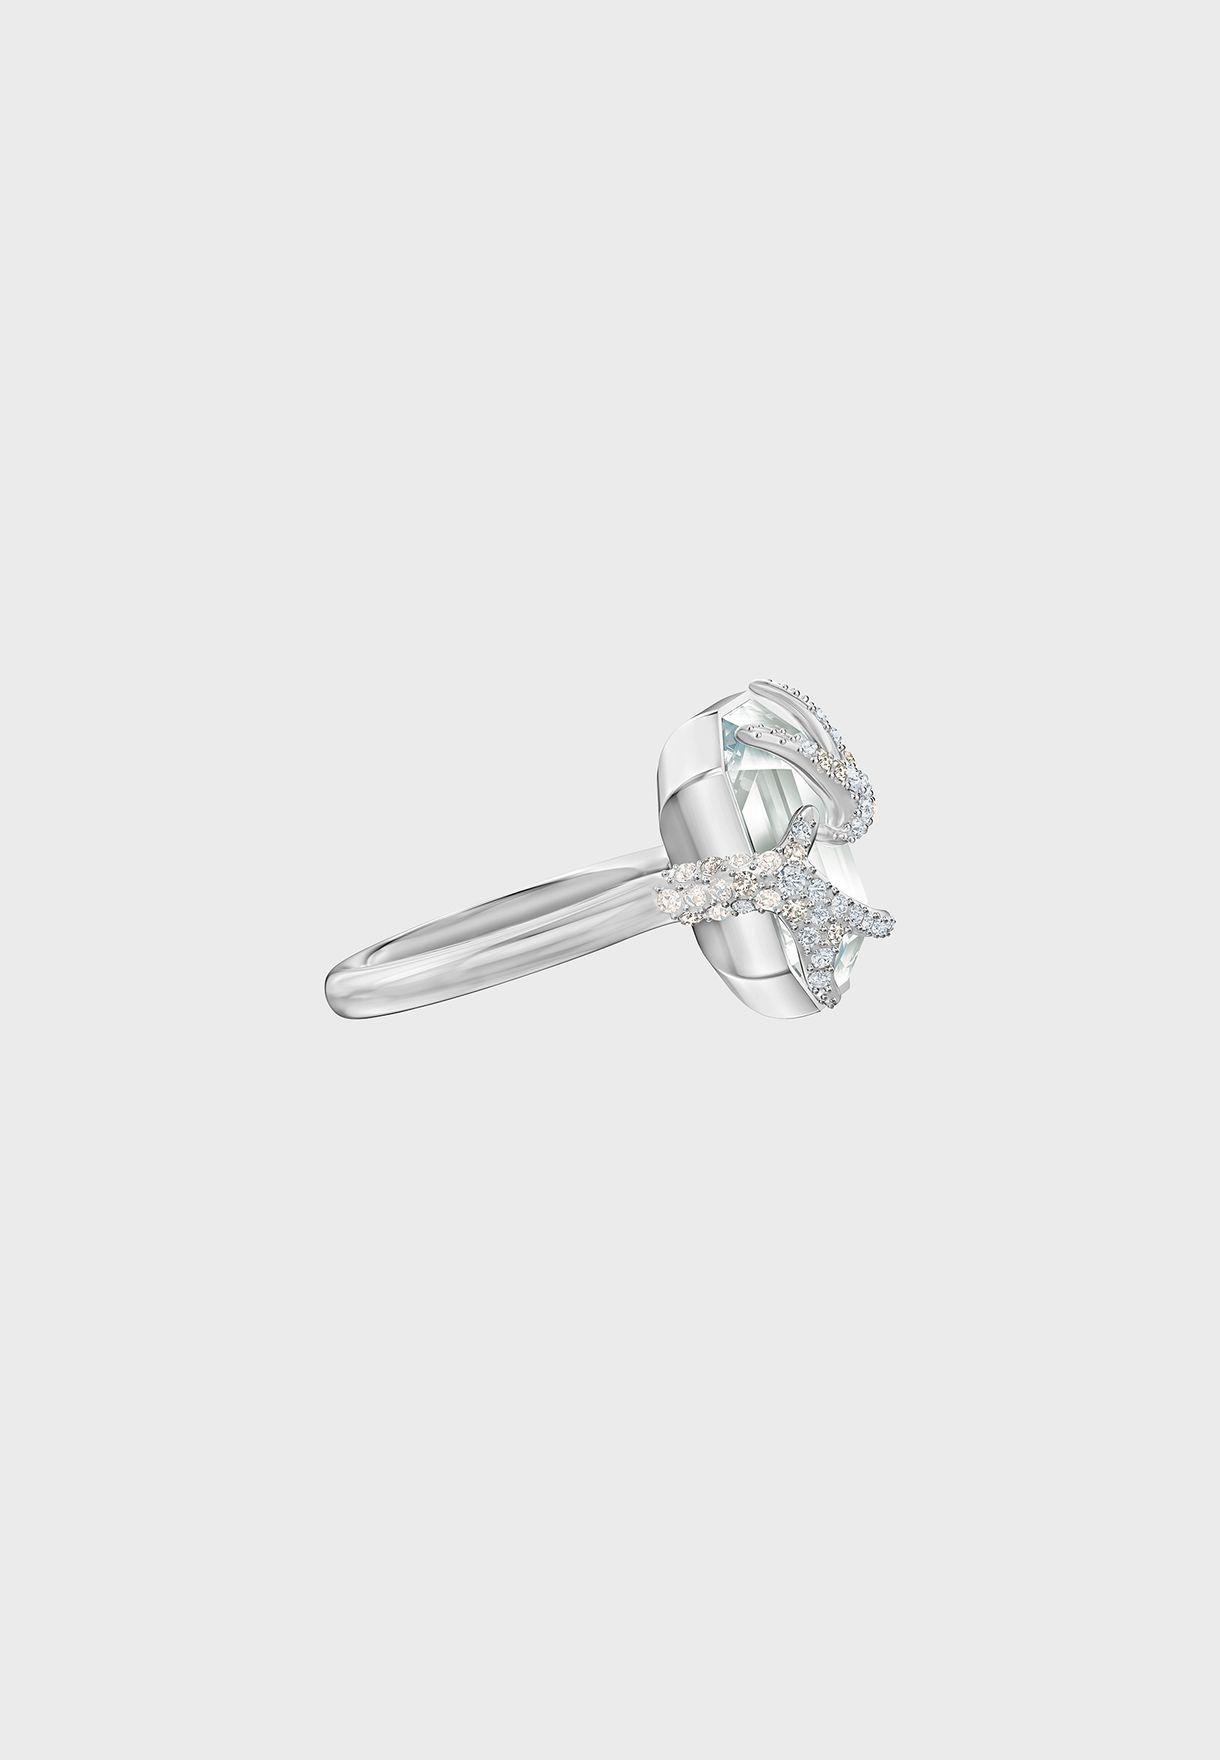 Shop Swarovski Silver Polar Bestiary Antler Ring 5497706 5515092